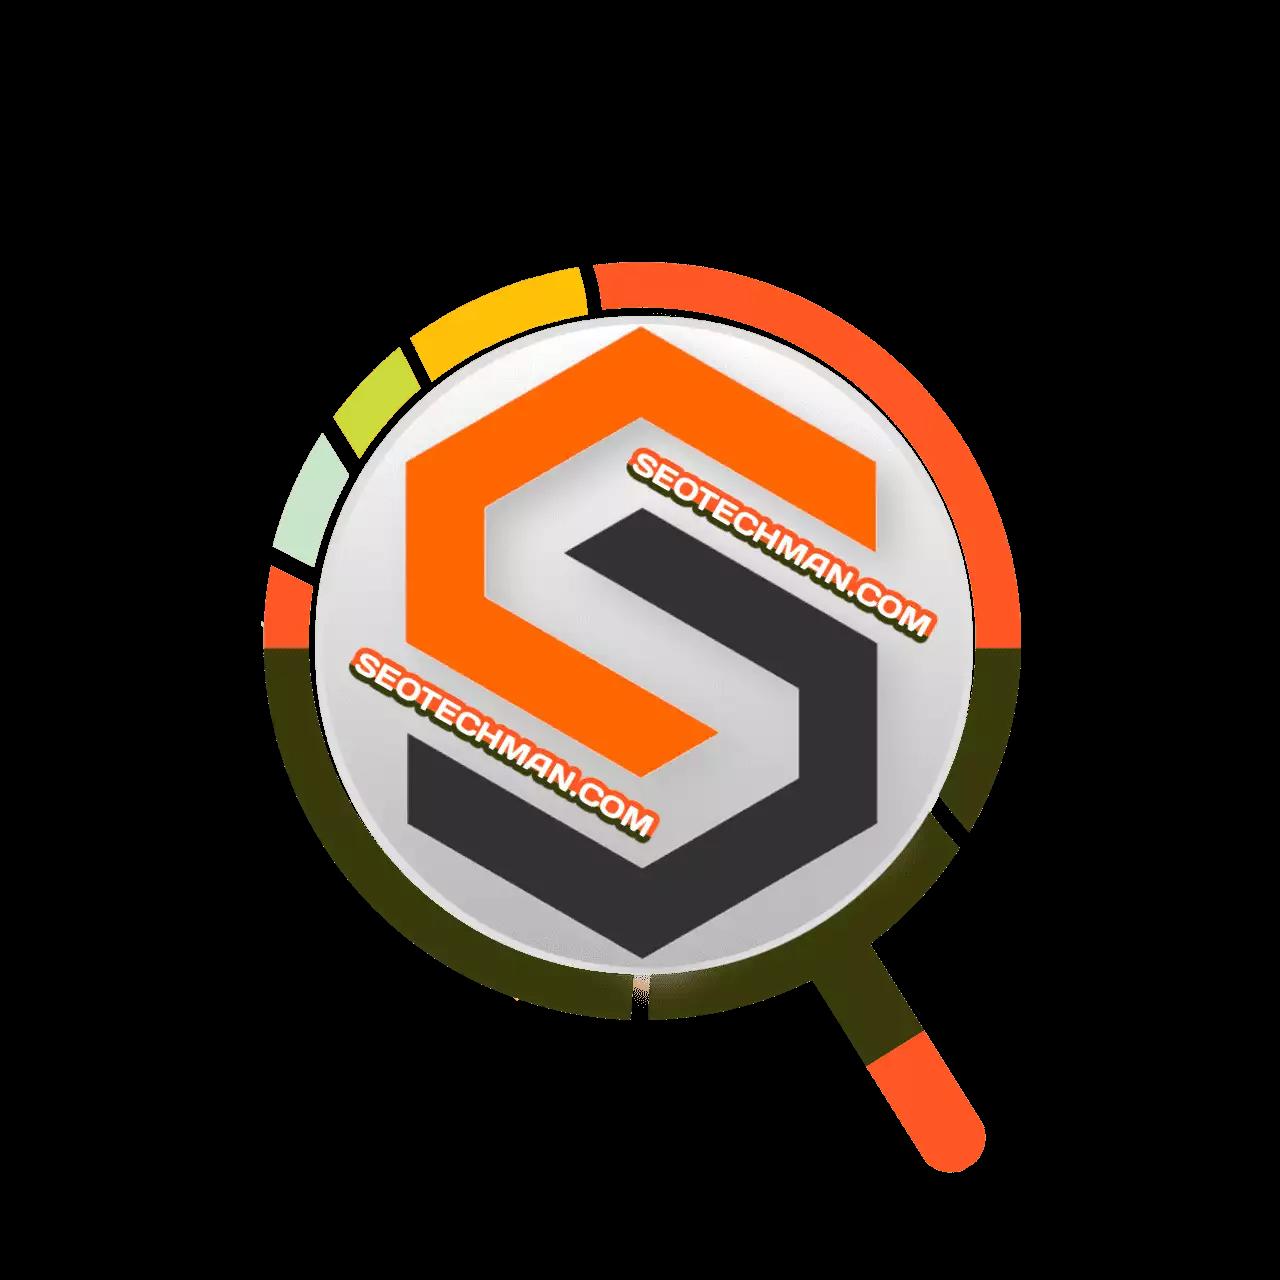 Seotechman Logo